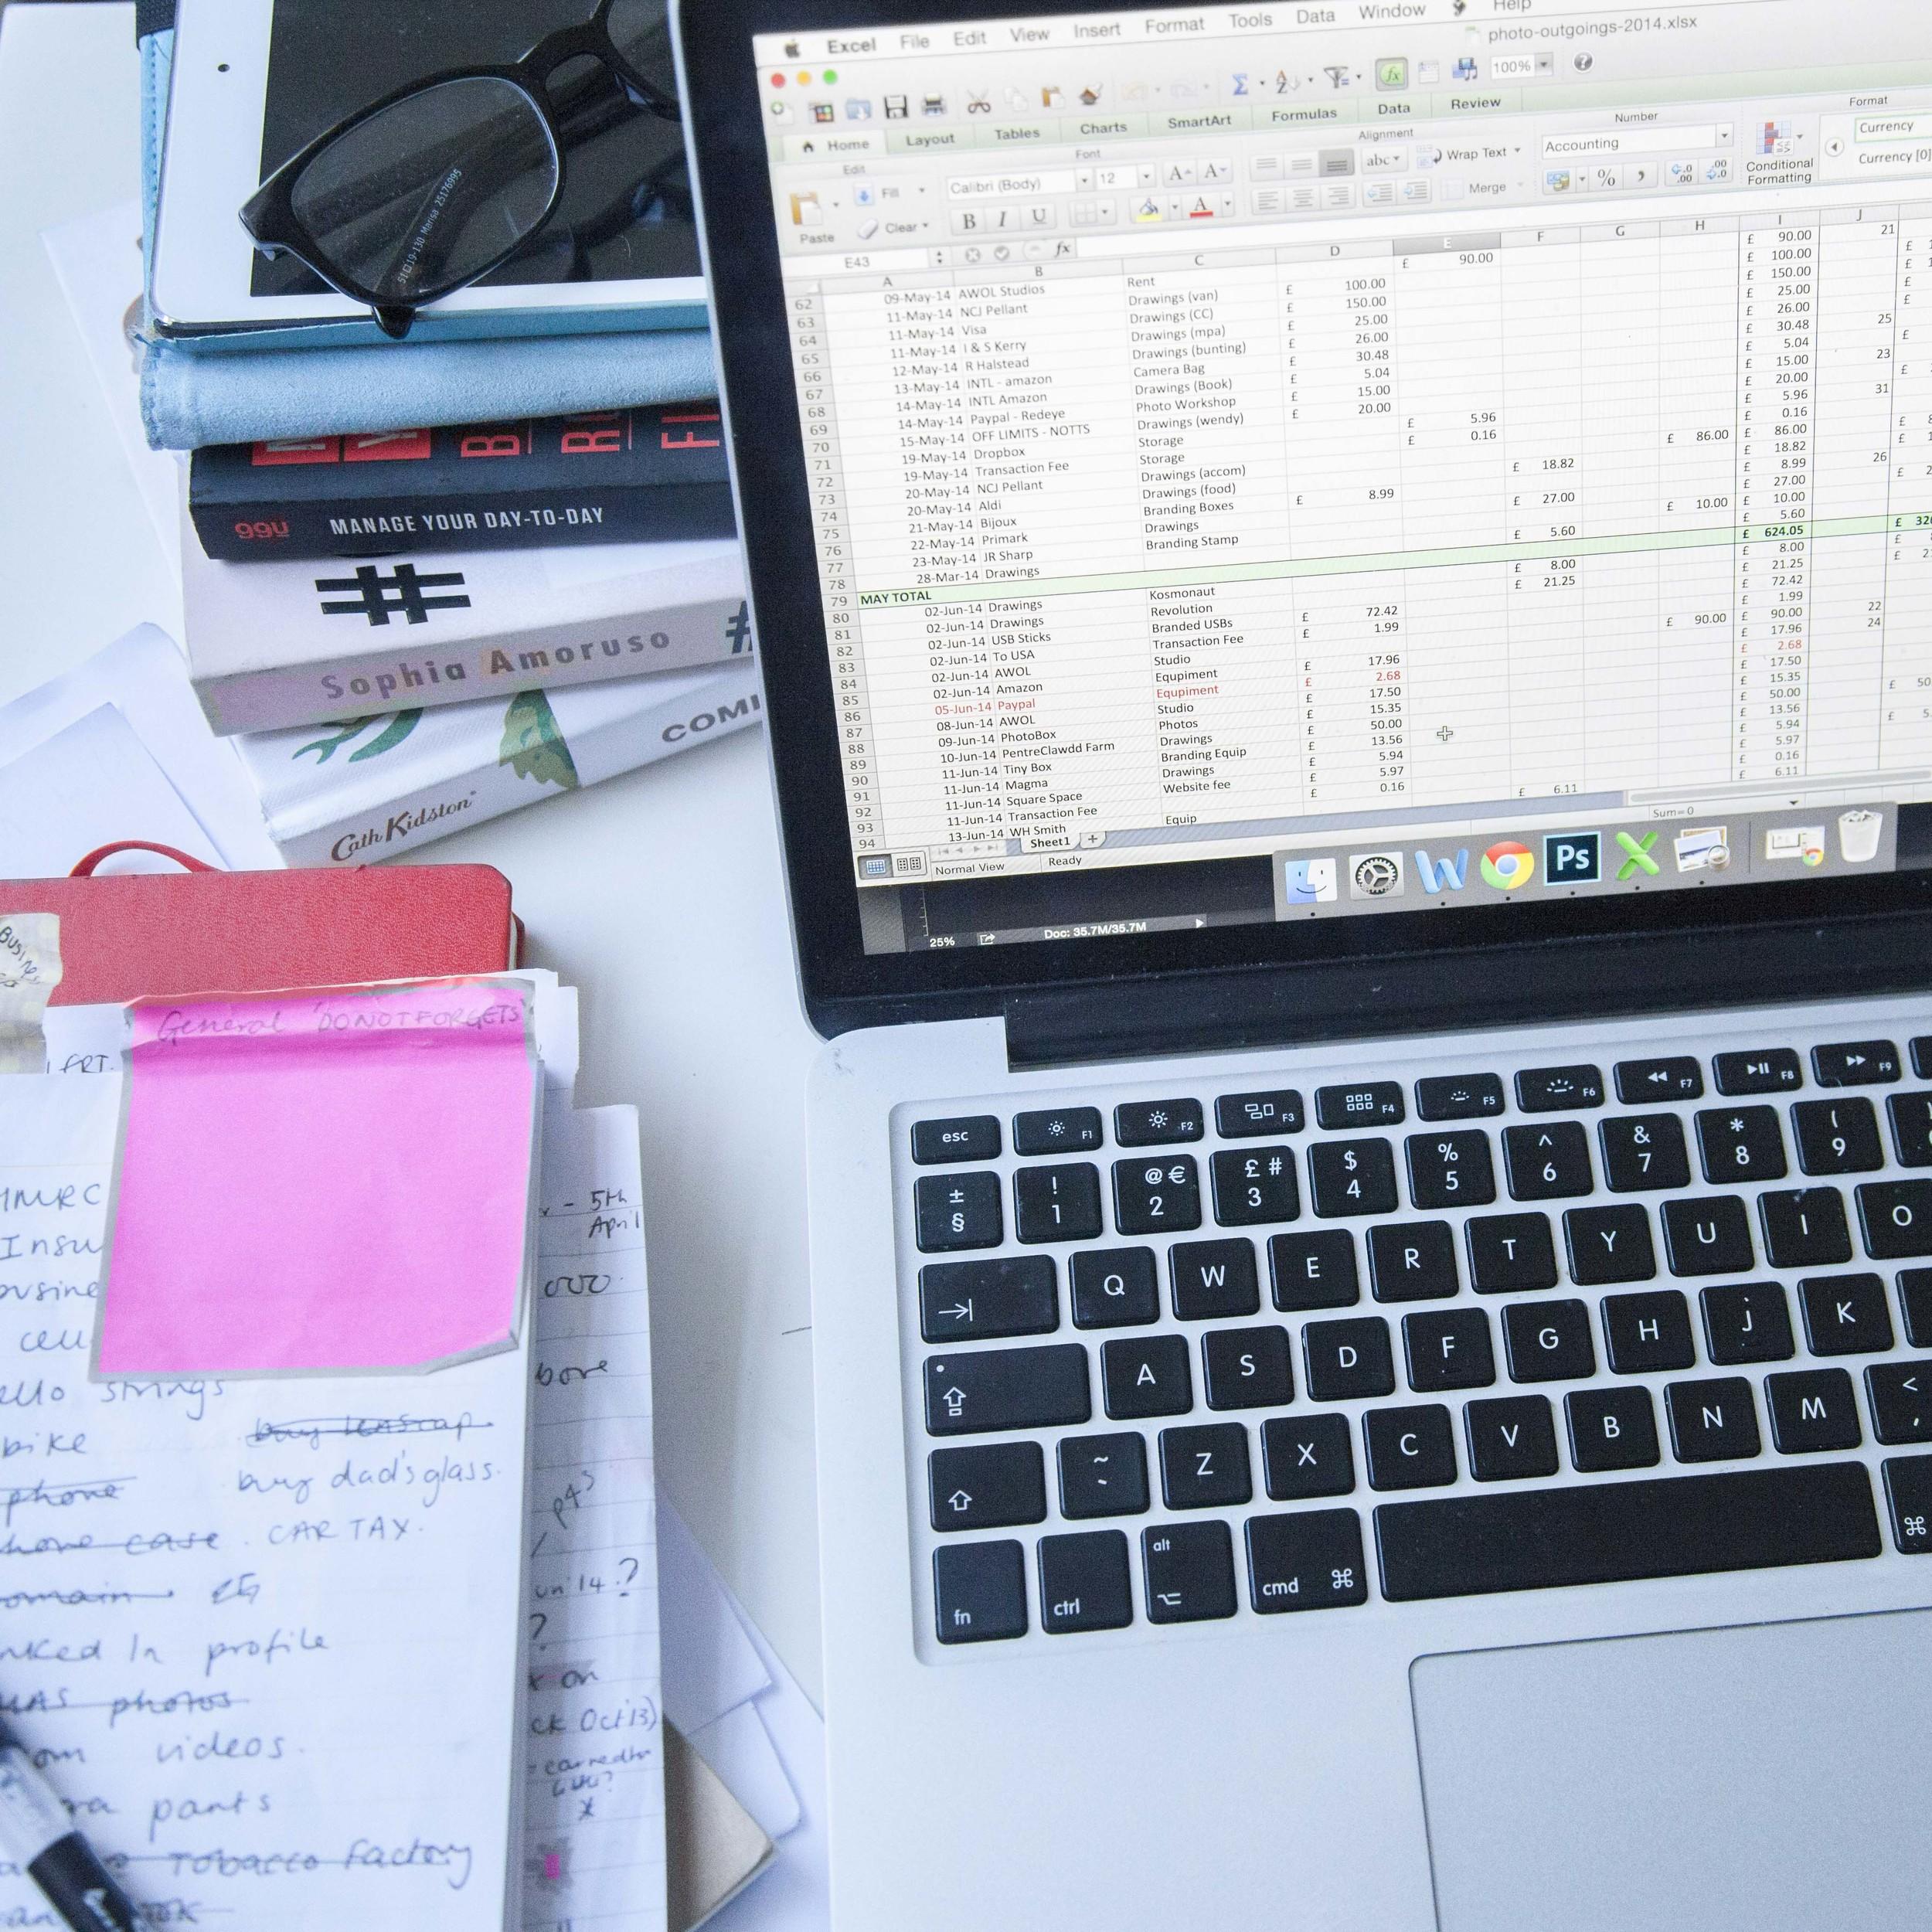 organisation-creative-blog-post_6.jpg